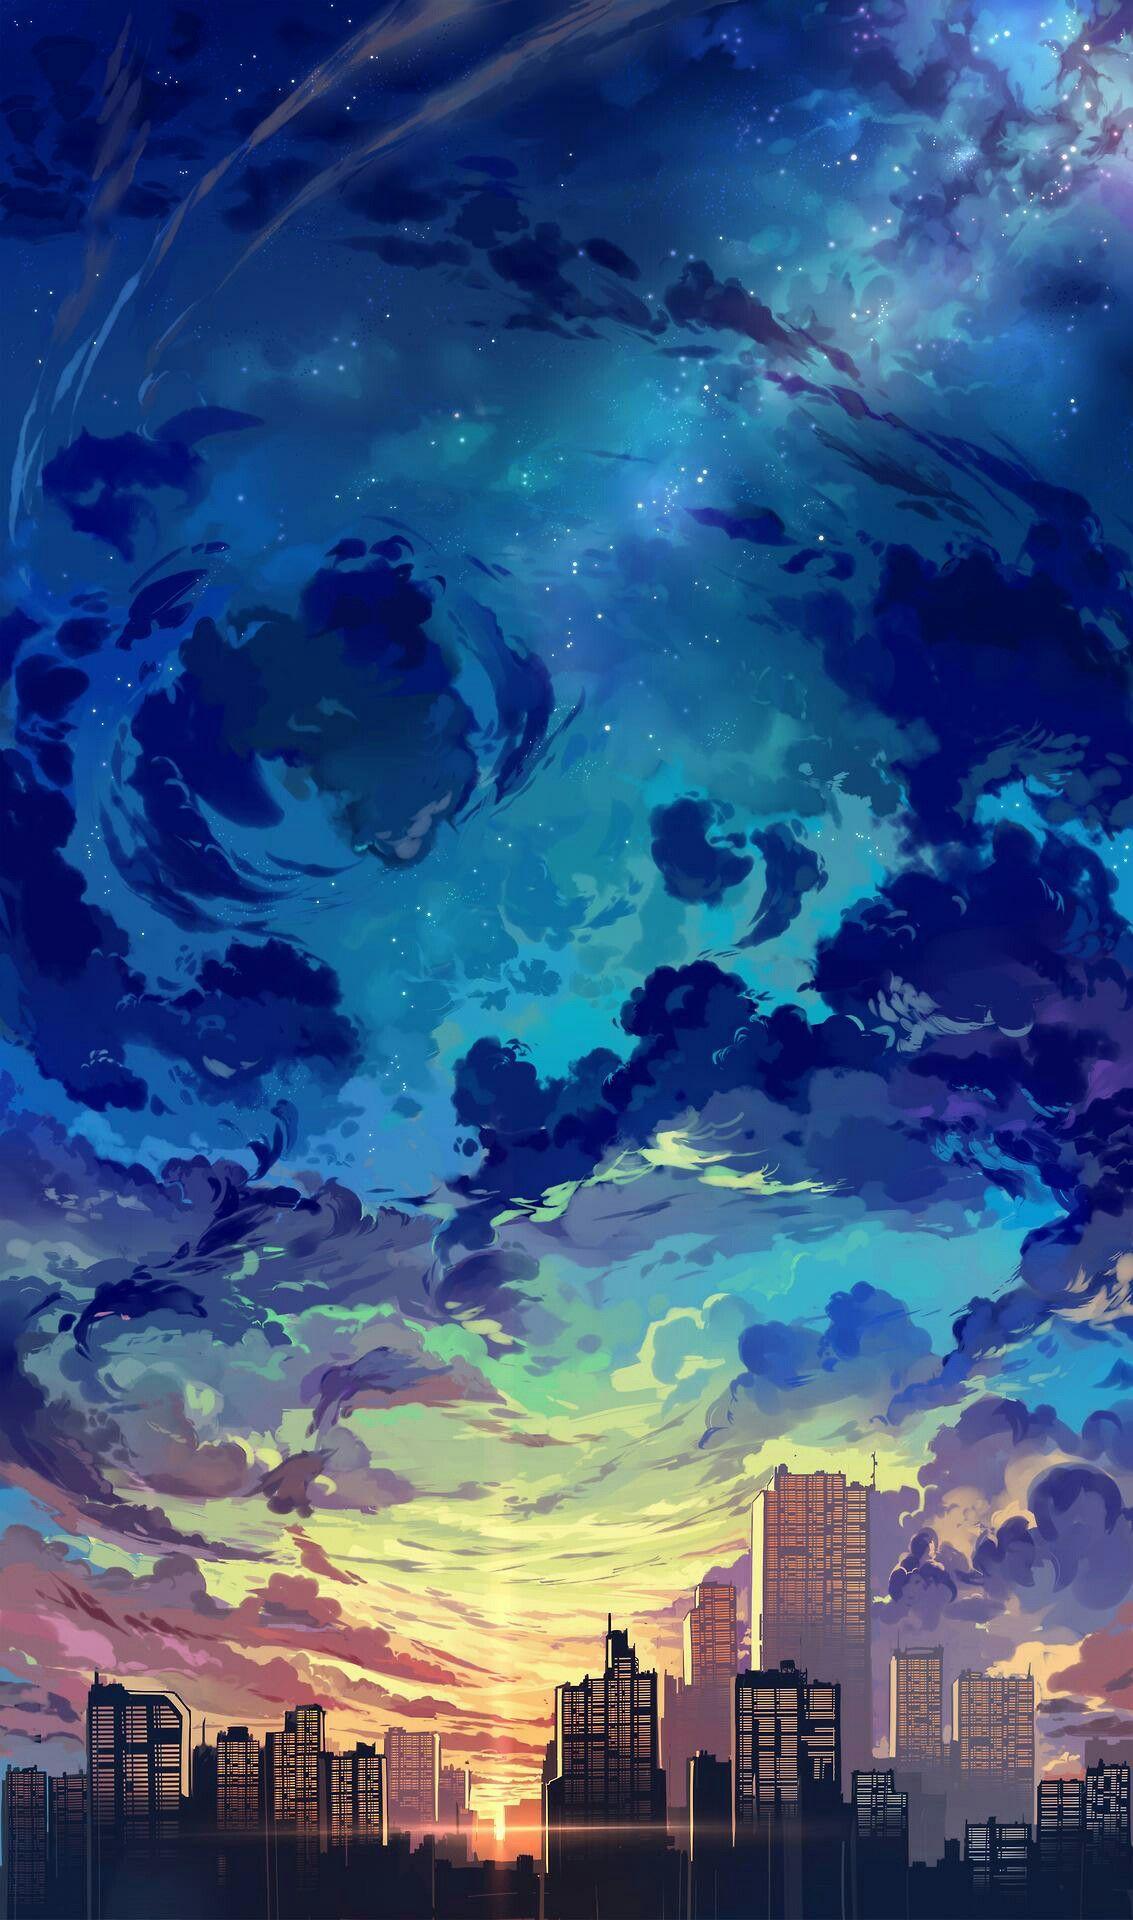 Anime Background Moving : anime, background, moving, Skyline, Anime, Scenery, Wallpaper,, Scenery,, Wallpaper